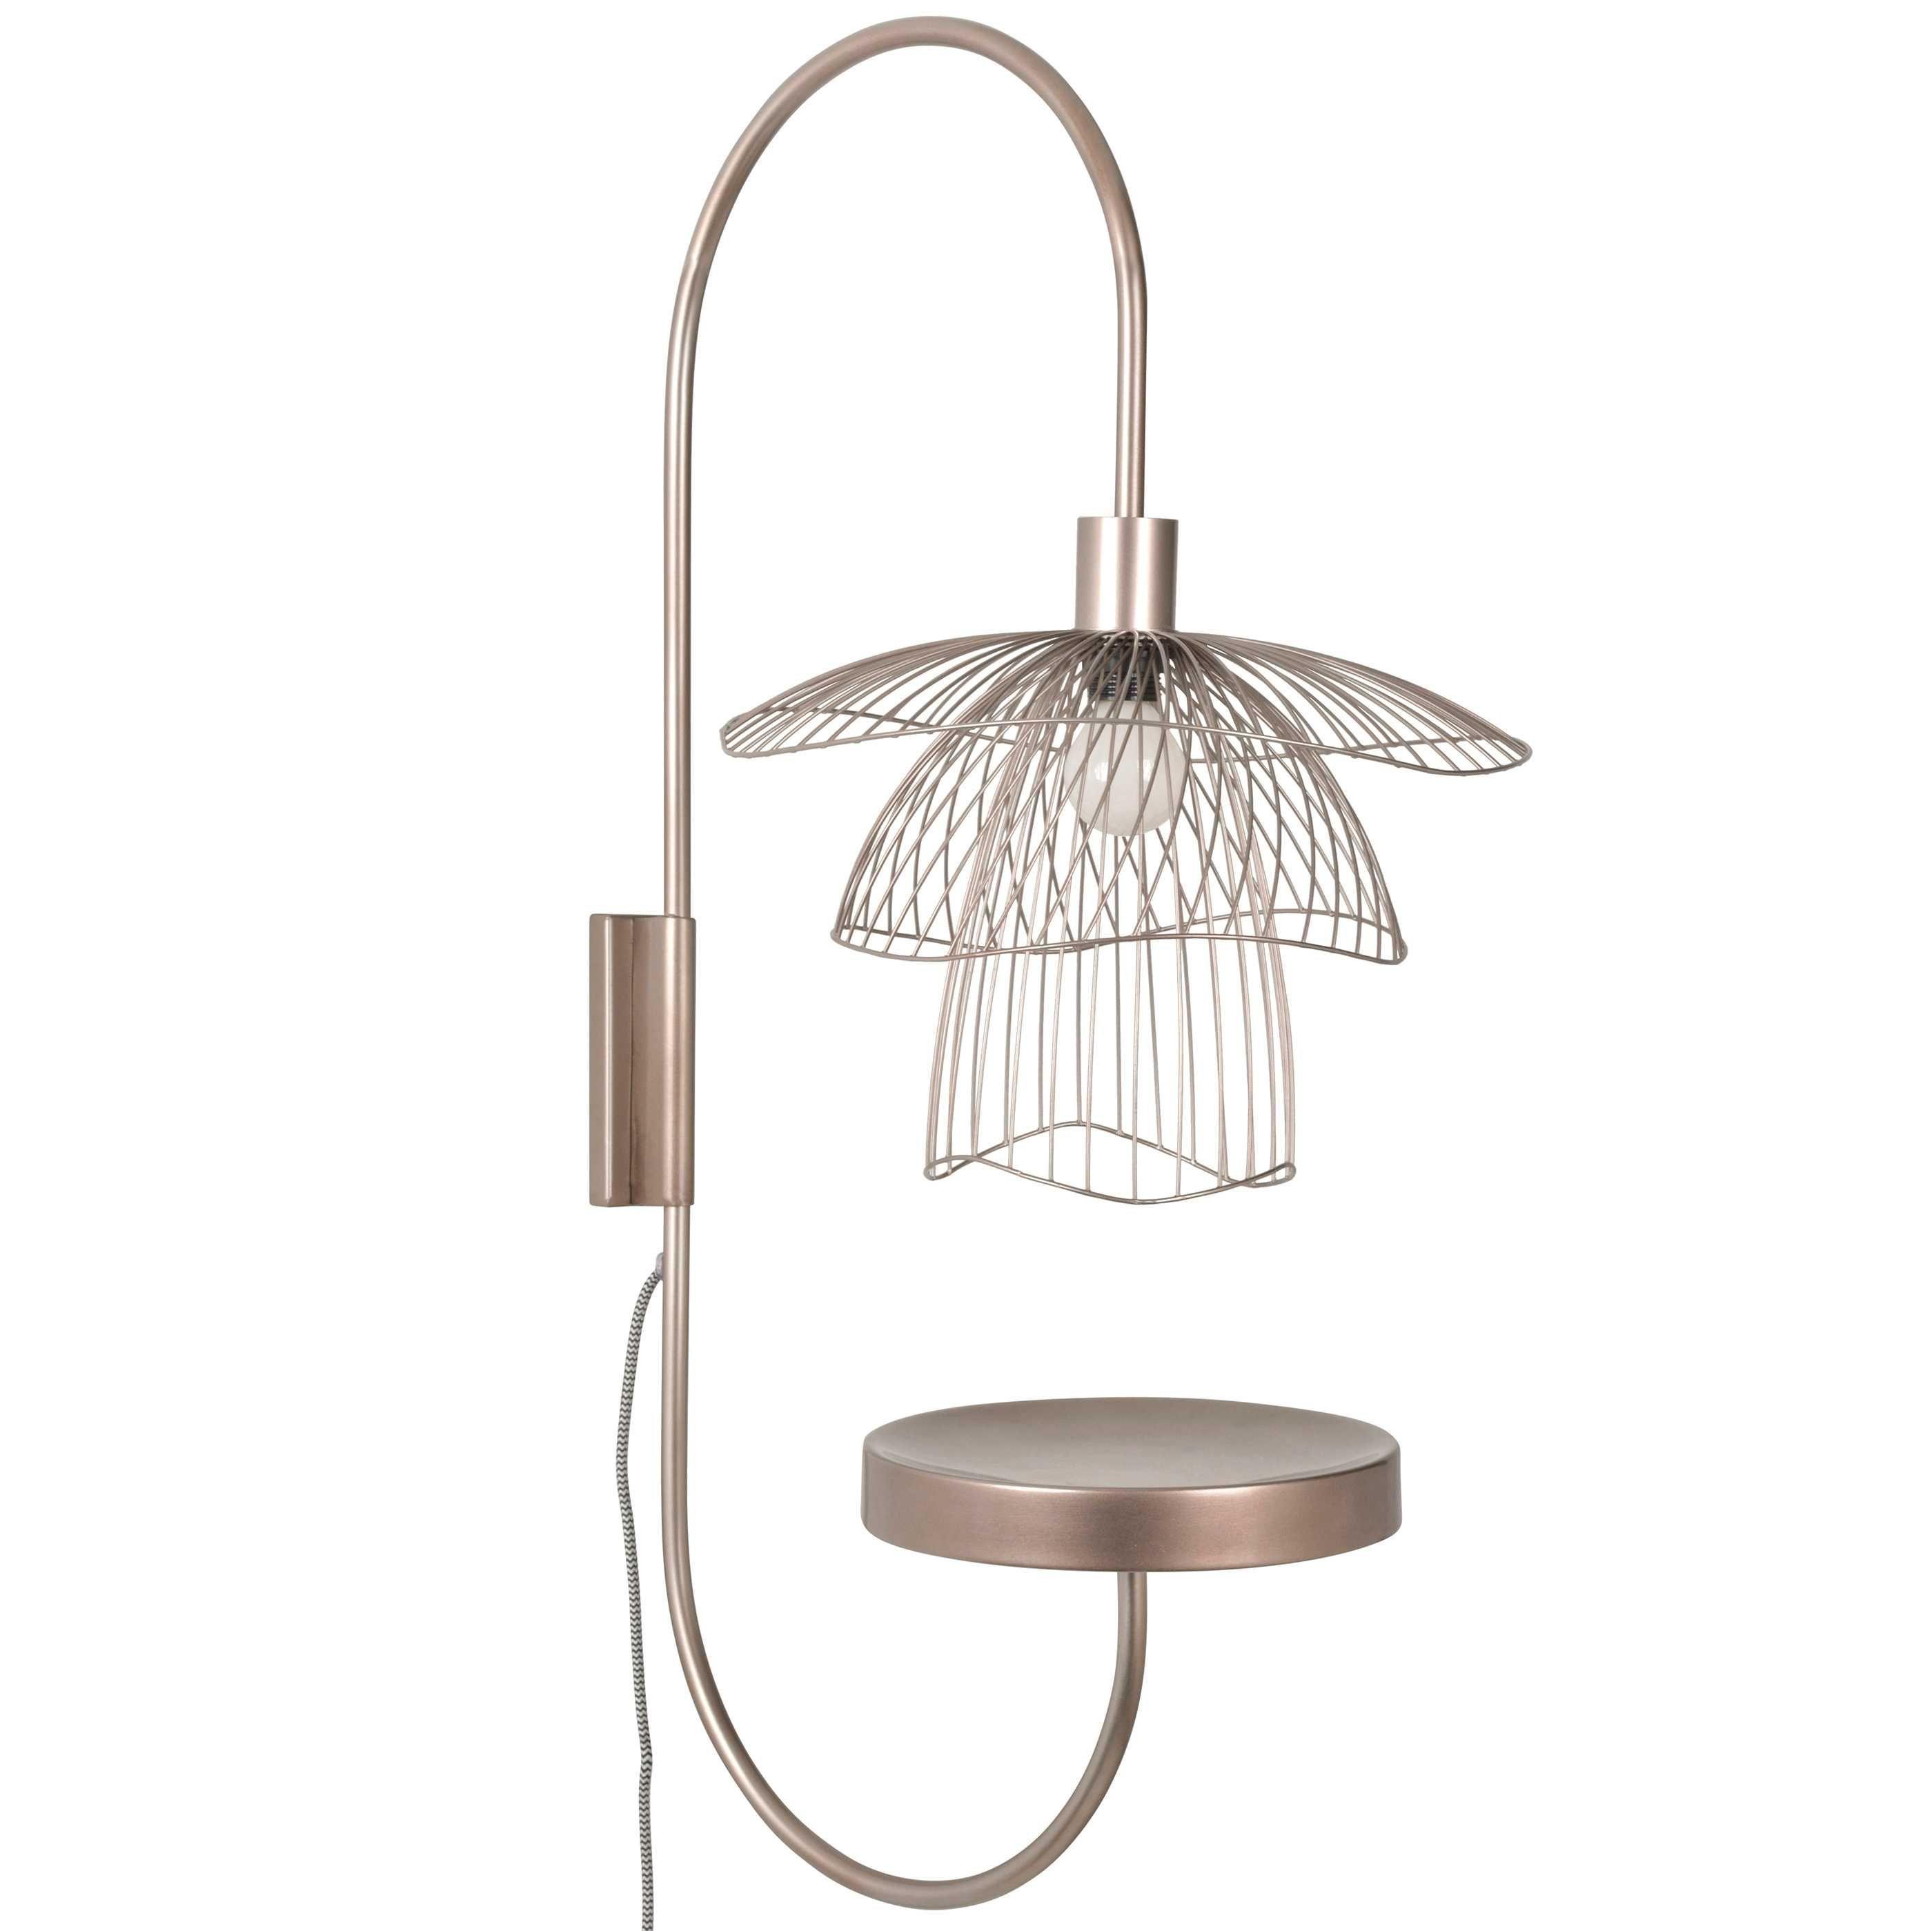 Forestier Papillon wandlamp met plateau metallic taupe